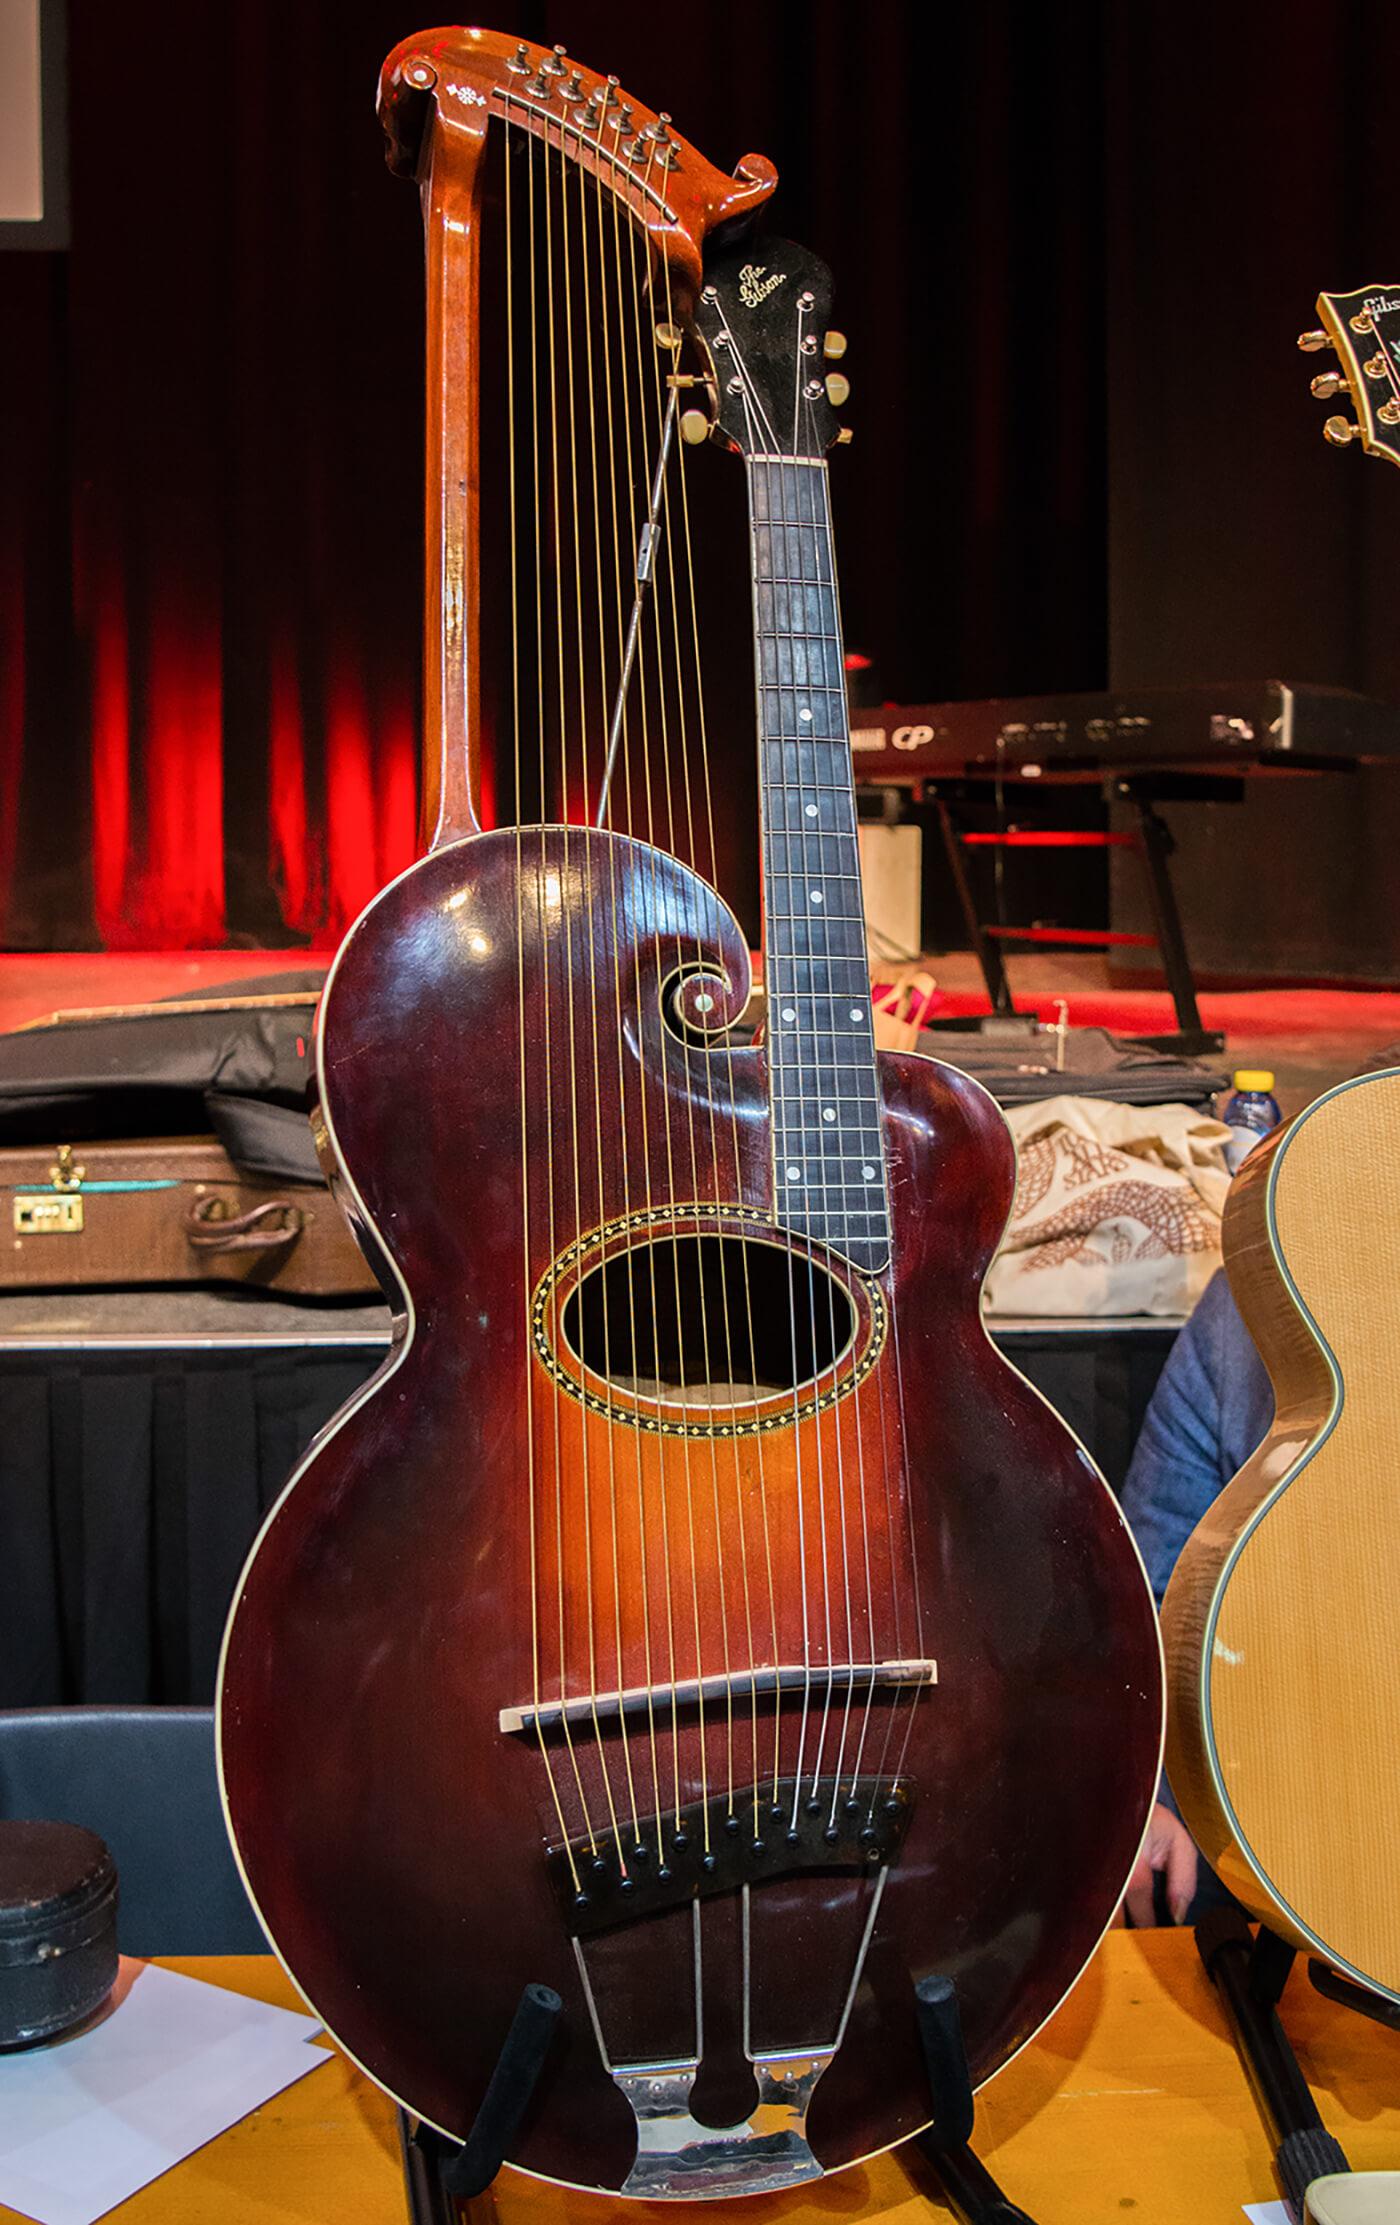 Gibson Harp Guitar